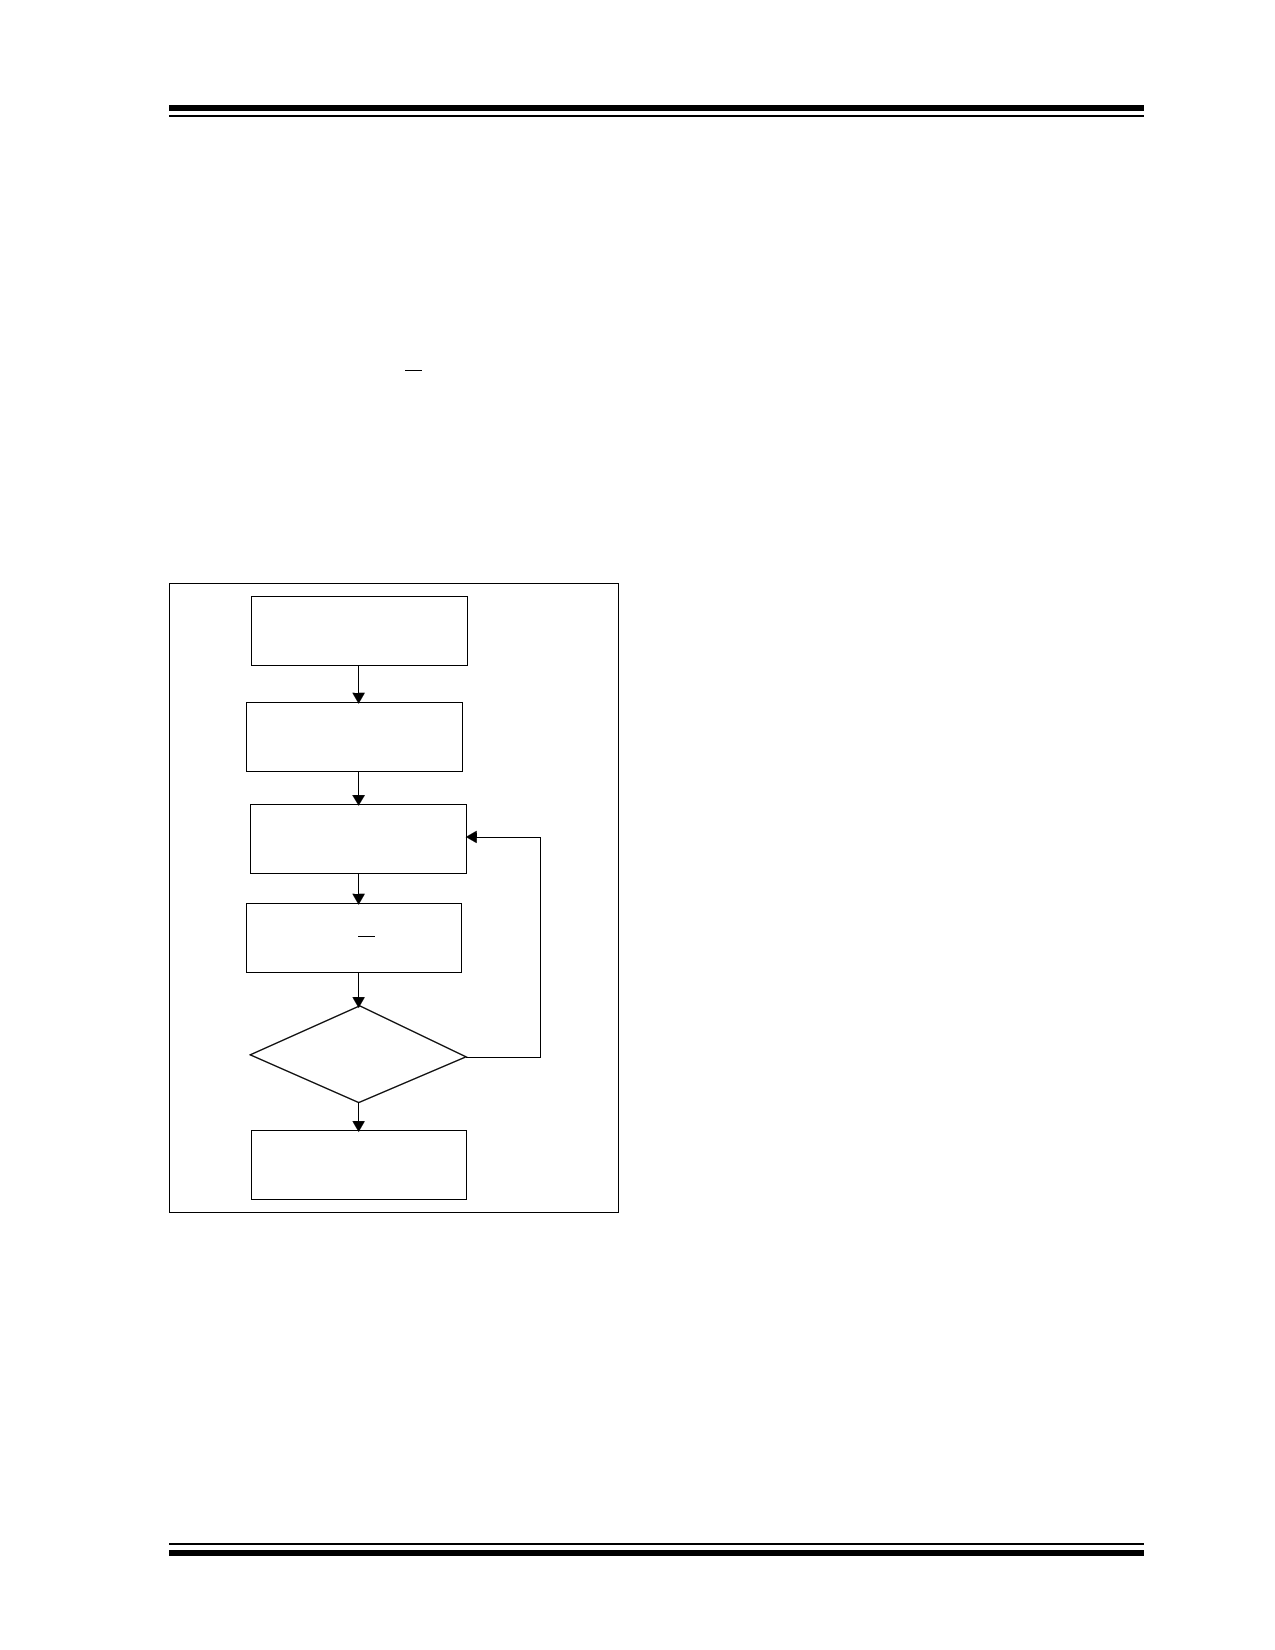 24LC02B diode, scr